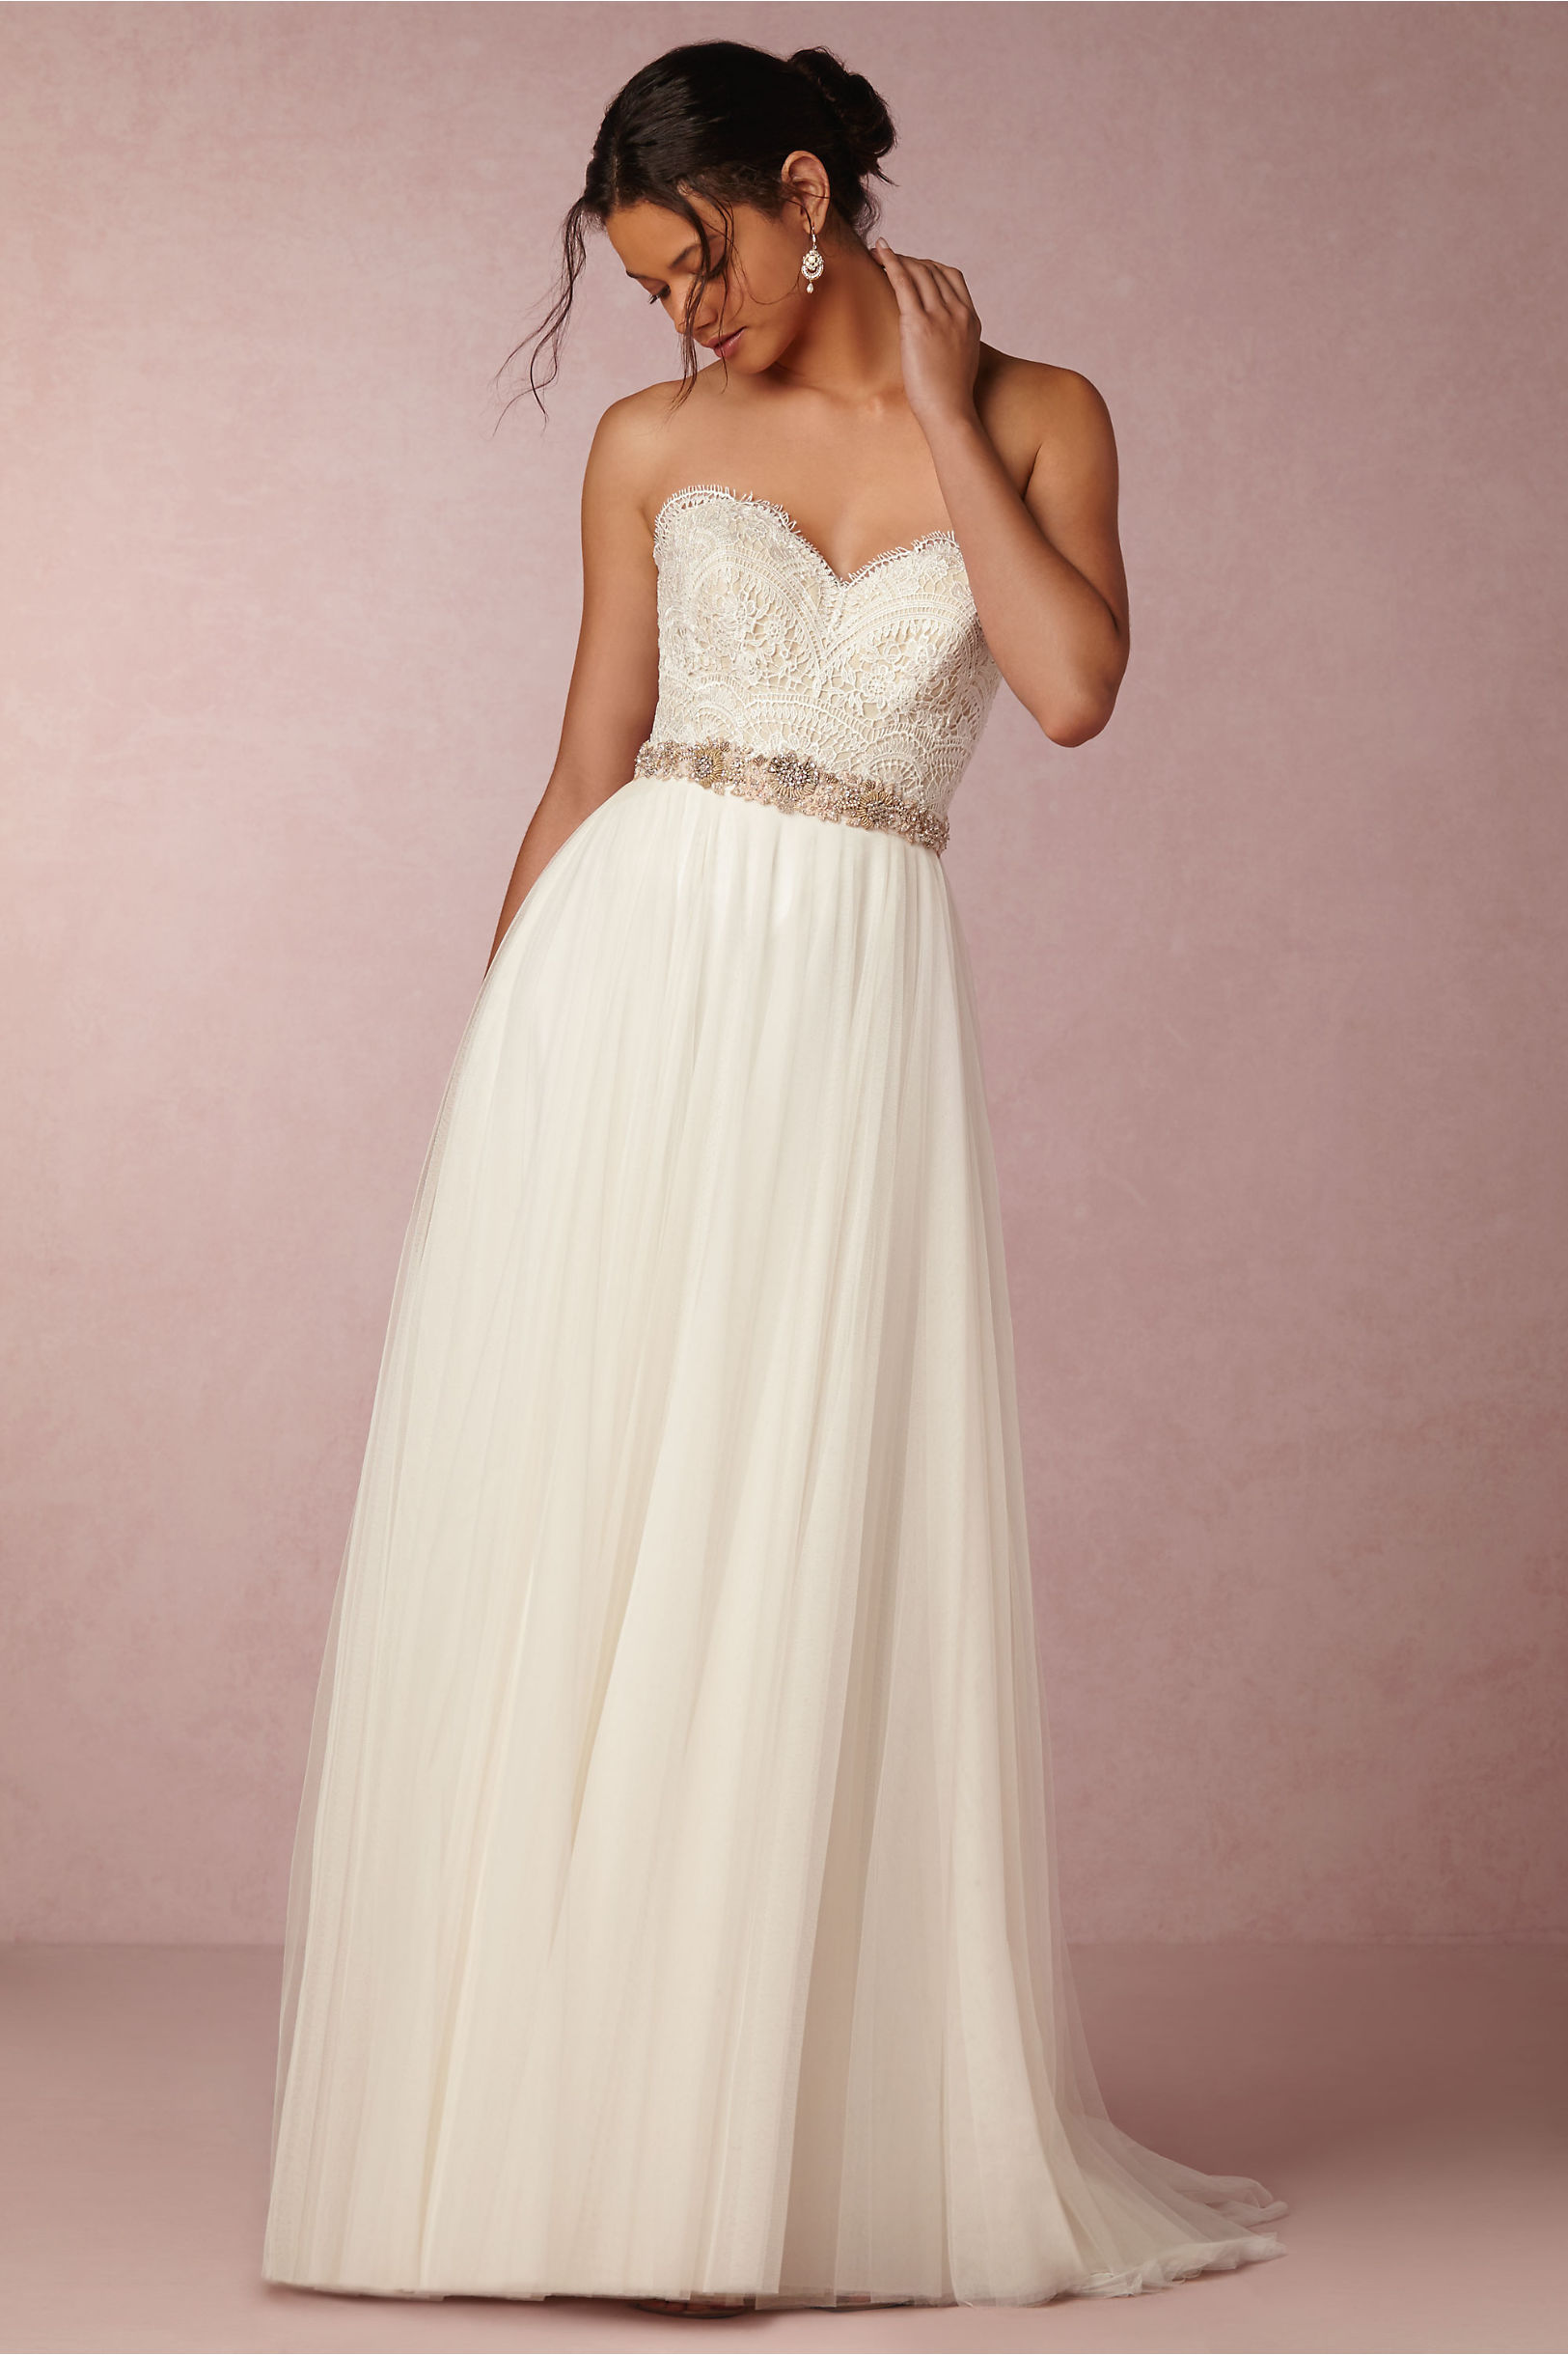 bride bridal separates wedding dress corset top Kinsey Corset Top Amora Skirt